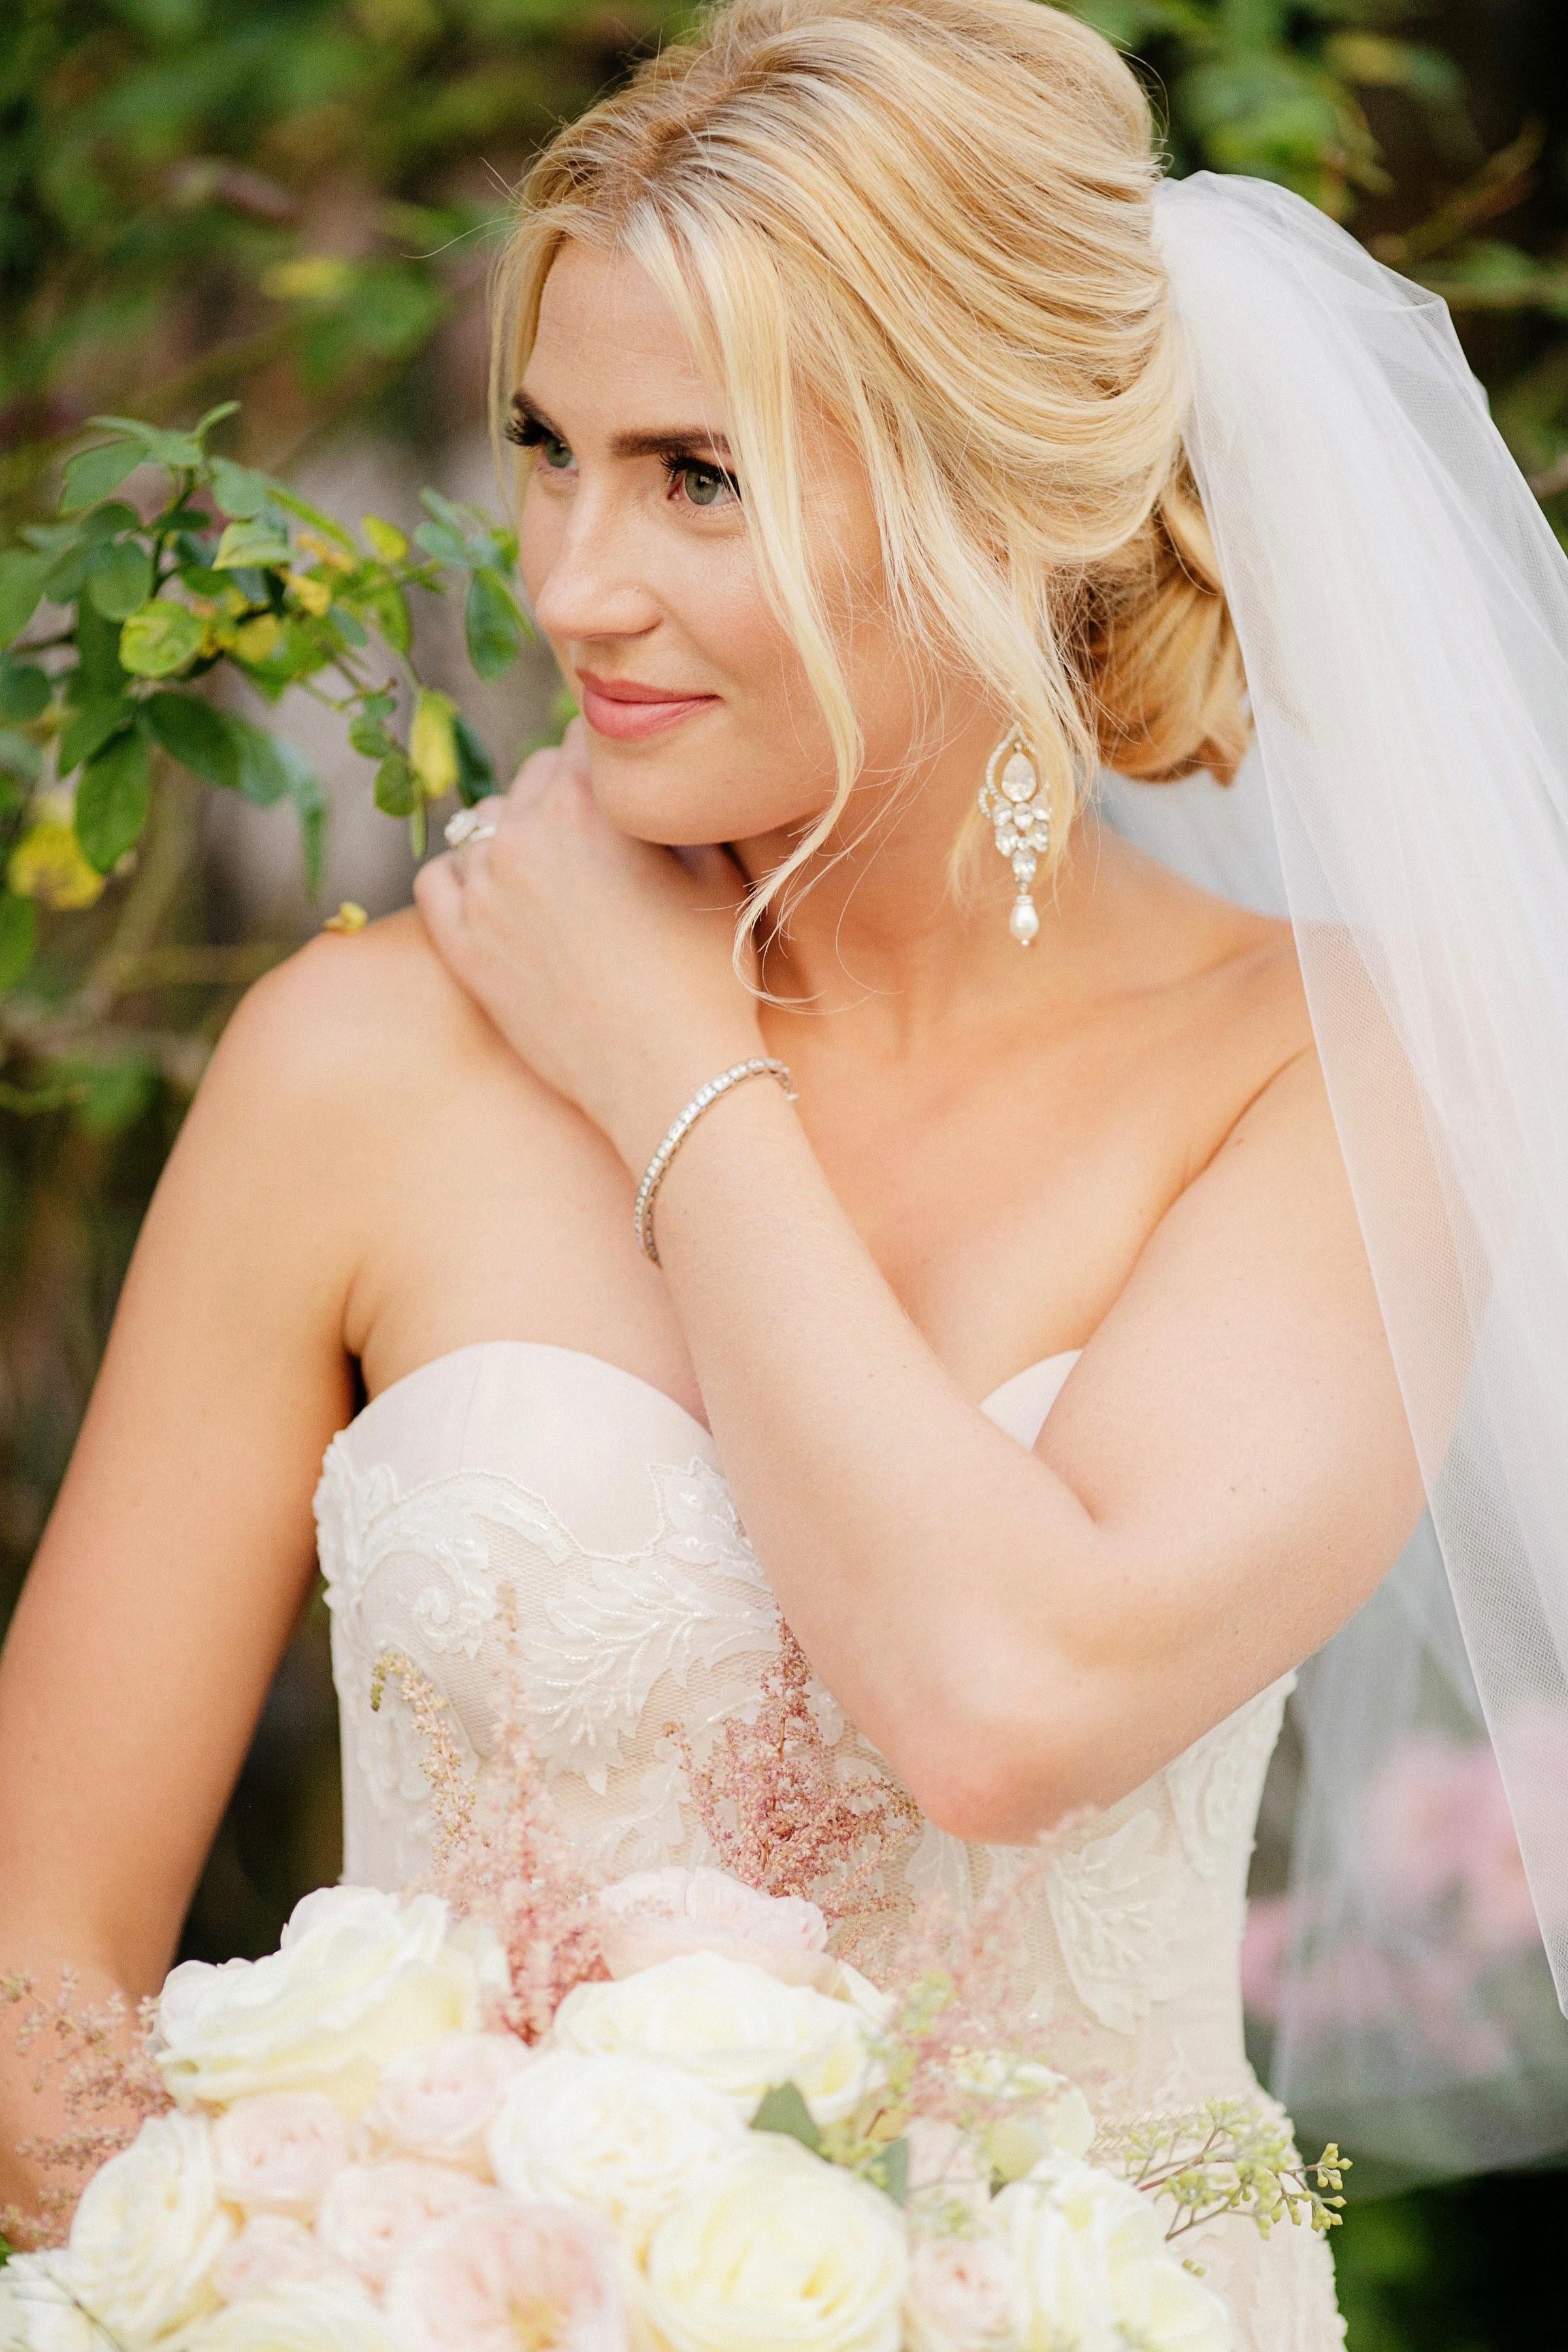 Crystal Bridal Earrings - Wedding Jewelry